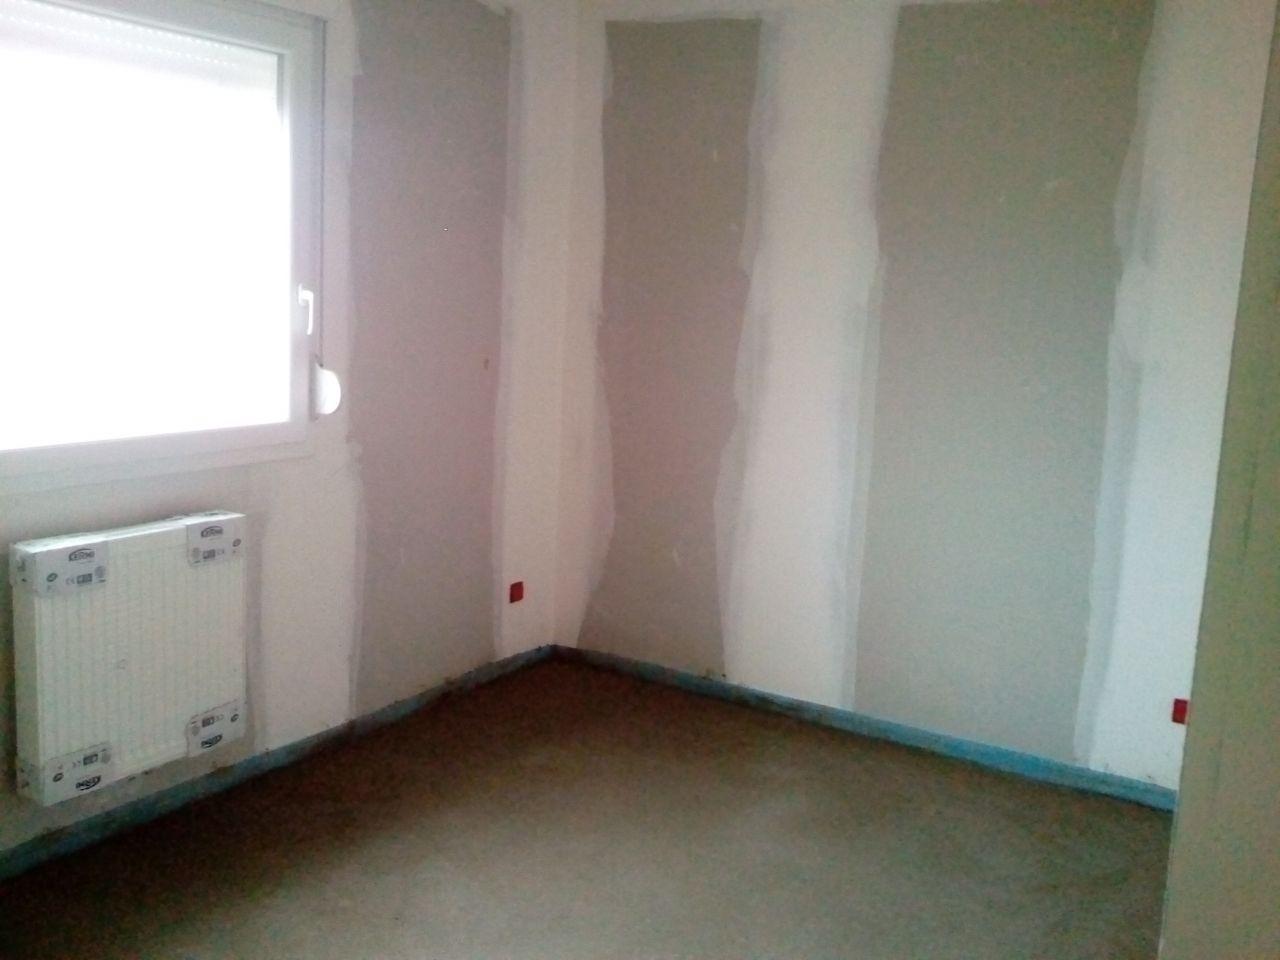 Chambre 2 avec radiateur